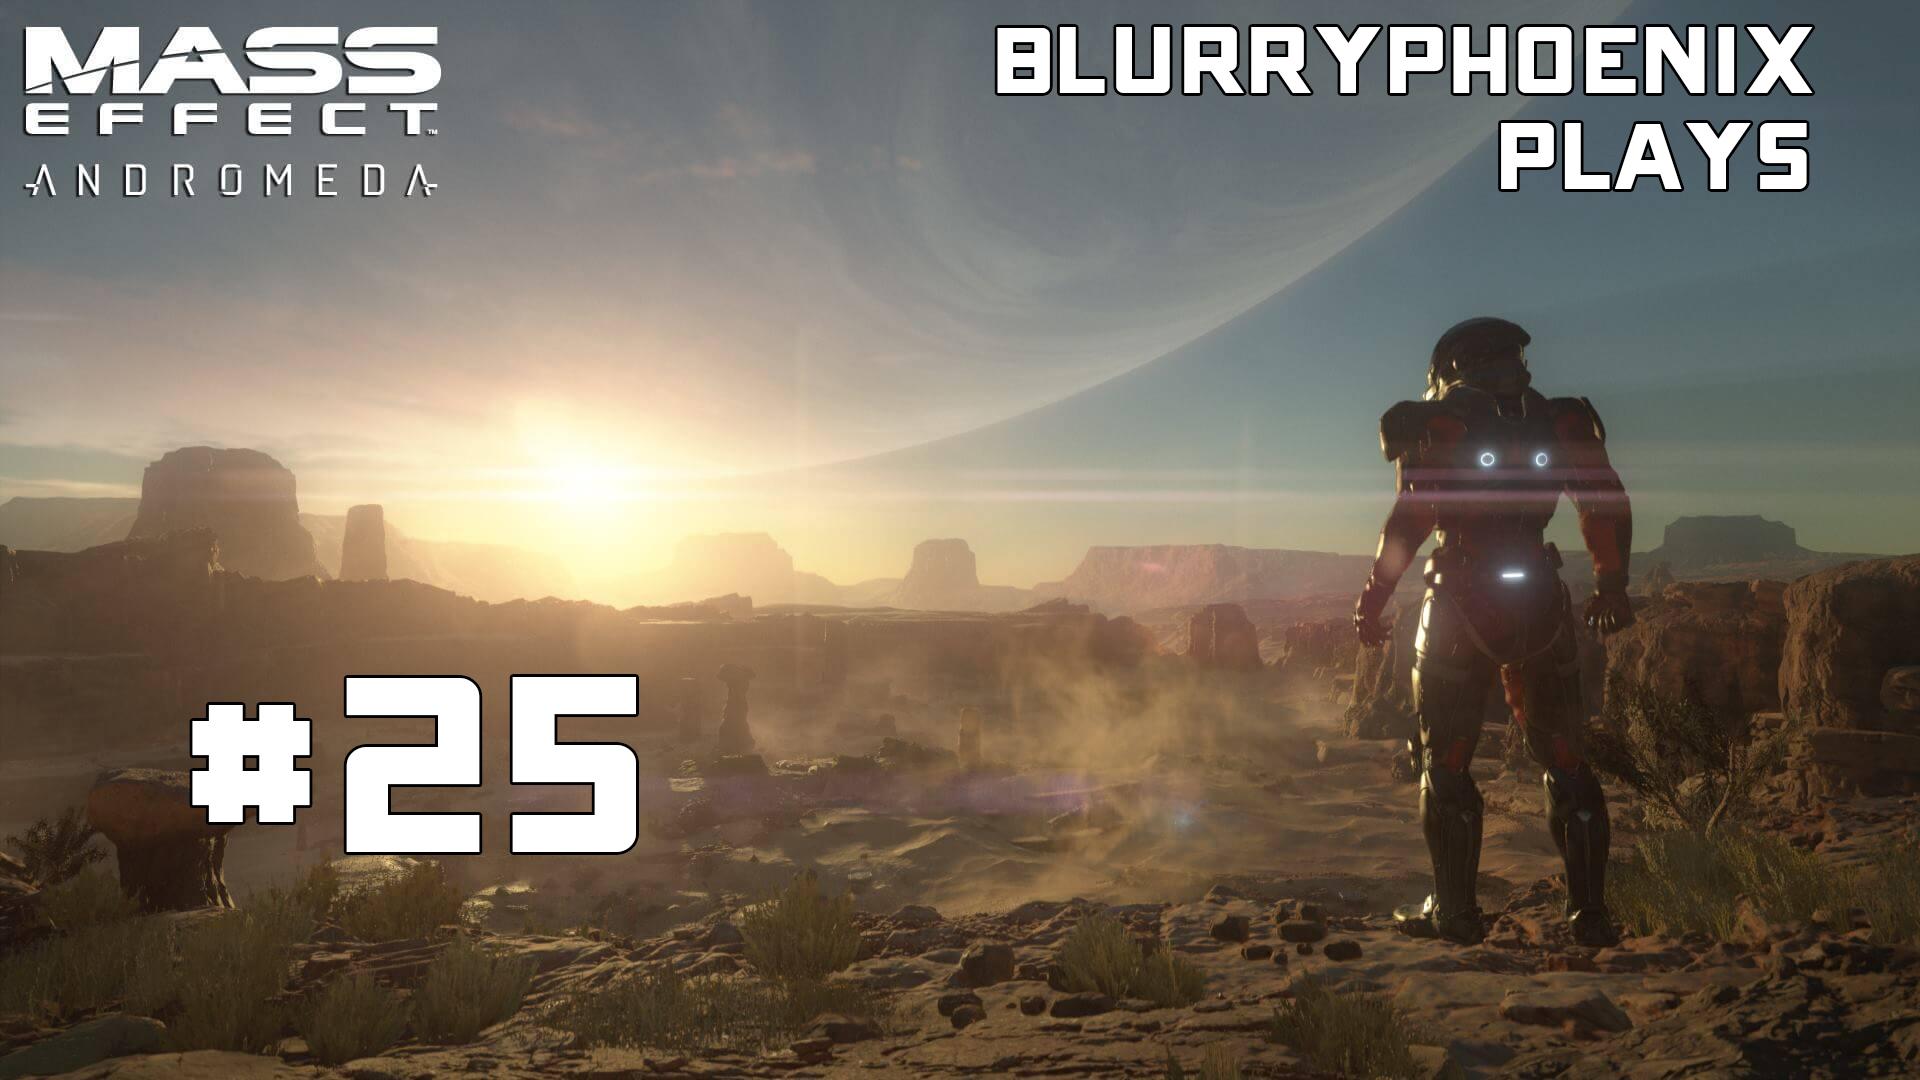 BlurryPhoenix Streams: Mass Effect – Andromeda (Pt. 25)